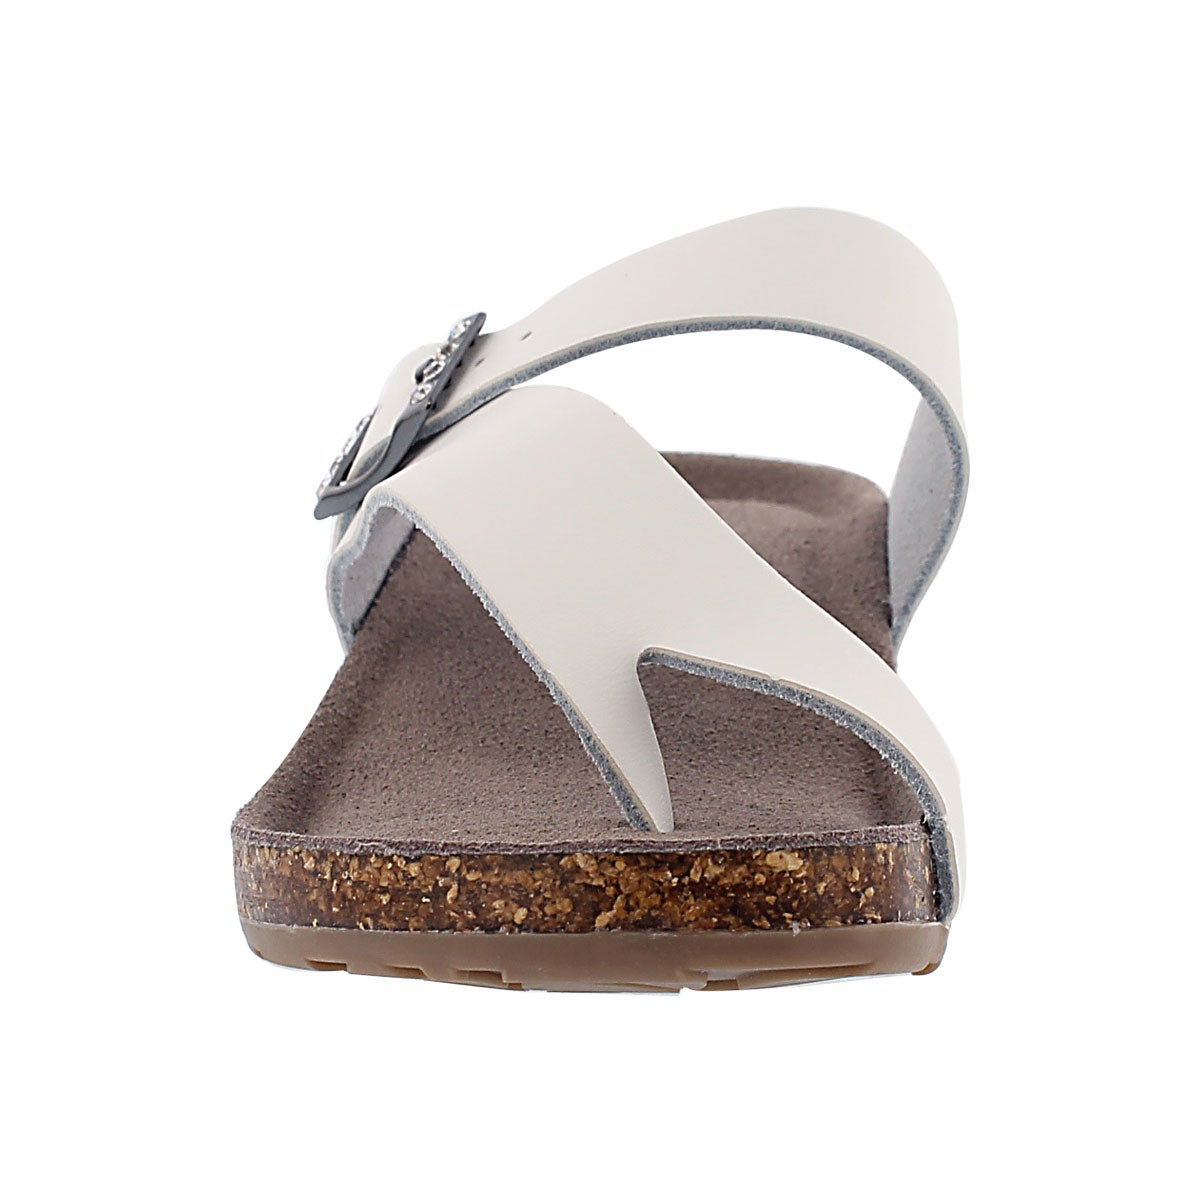 Sandale tong AMBER 3, blanc, femmes